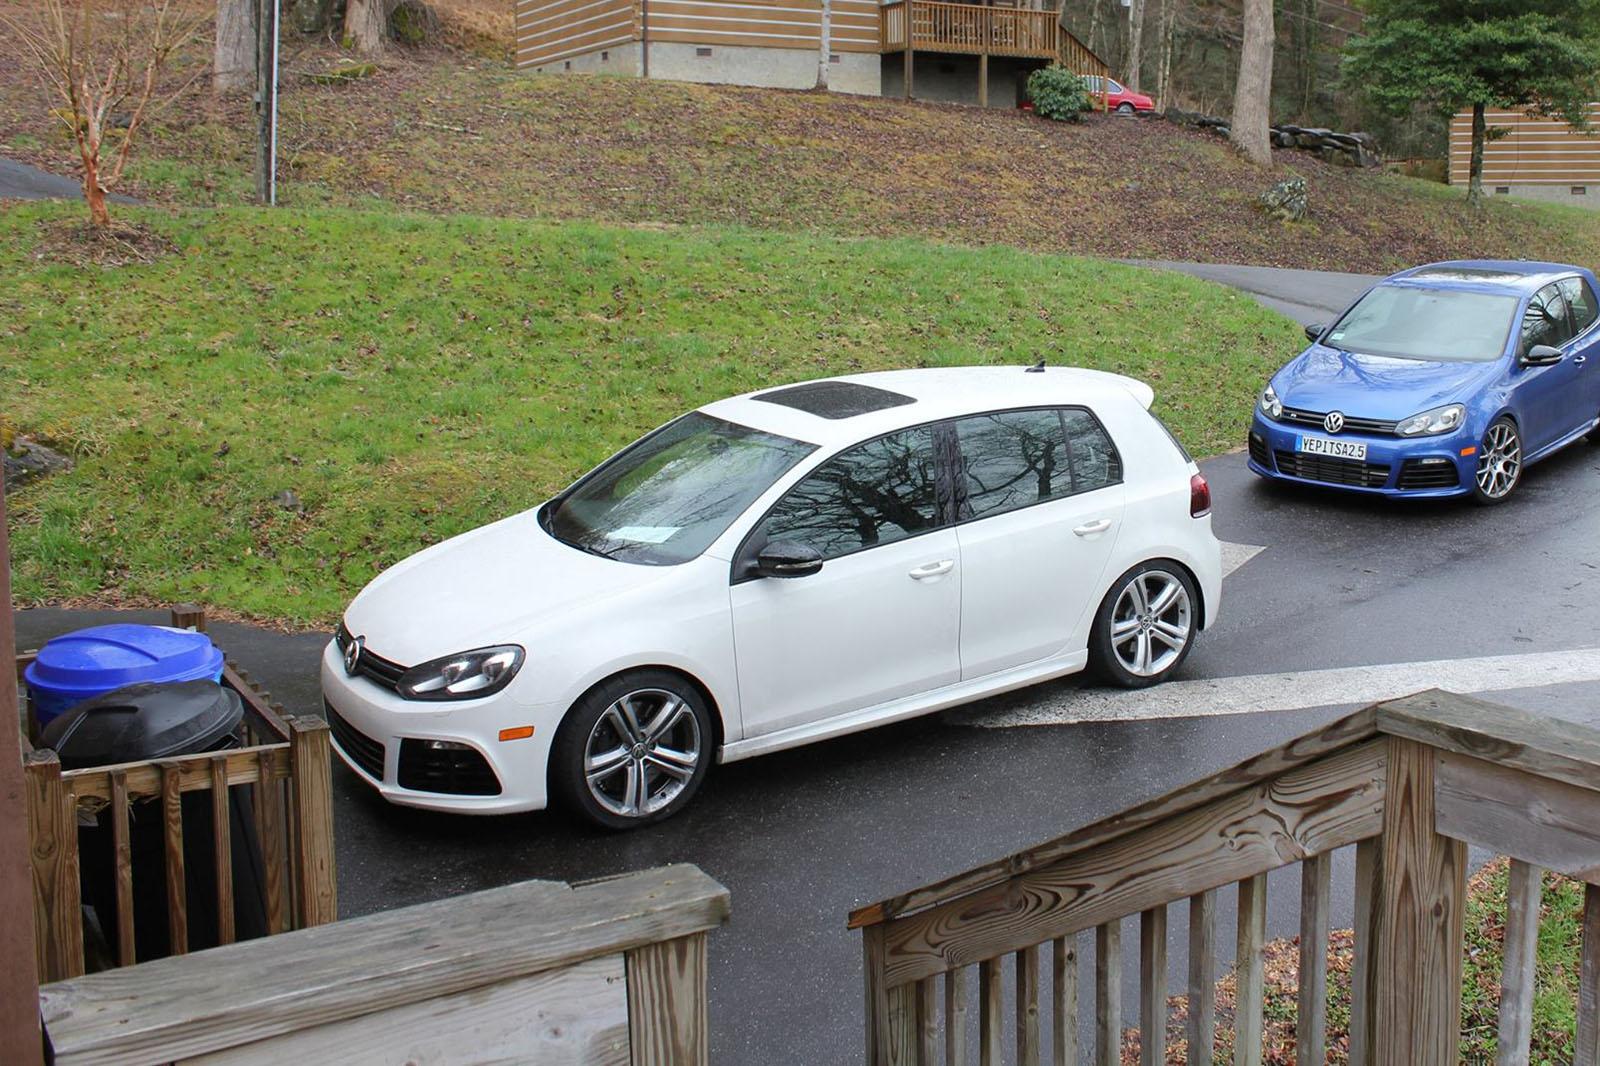 2013 golf r with a turbo inline five engine swap depot rh engineswapdepot com Volkswagen Golf Rally Car 2016 Volkswagen Golf R